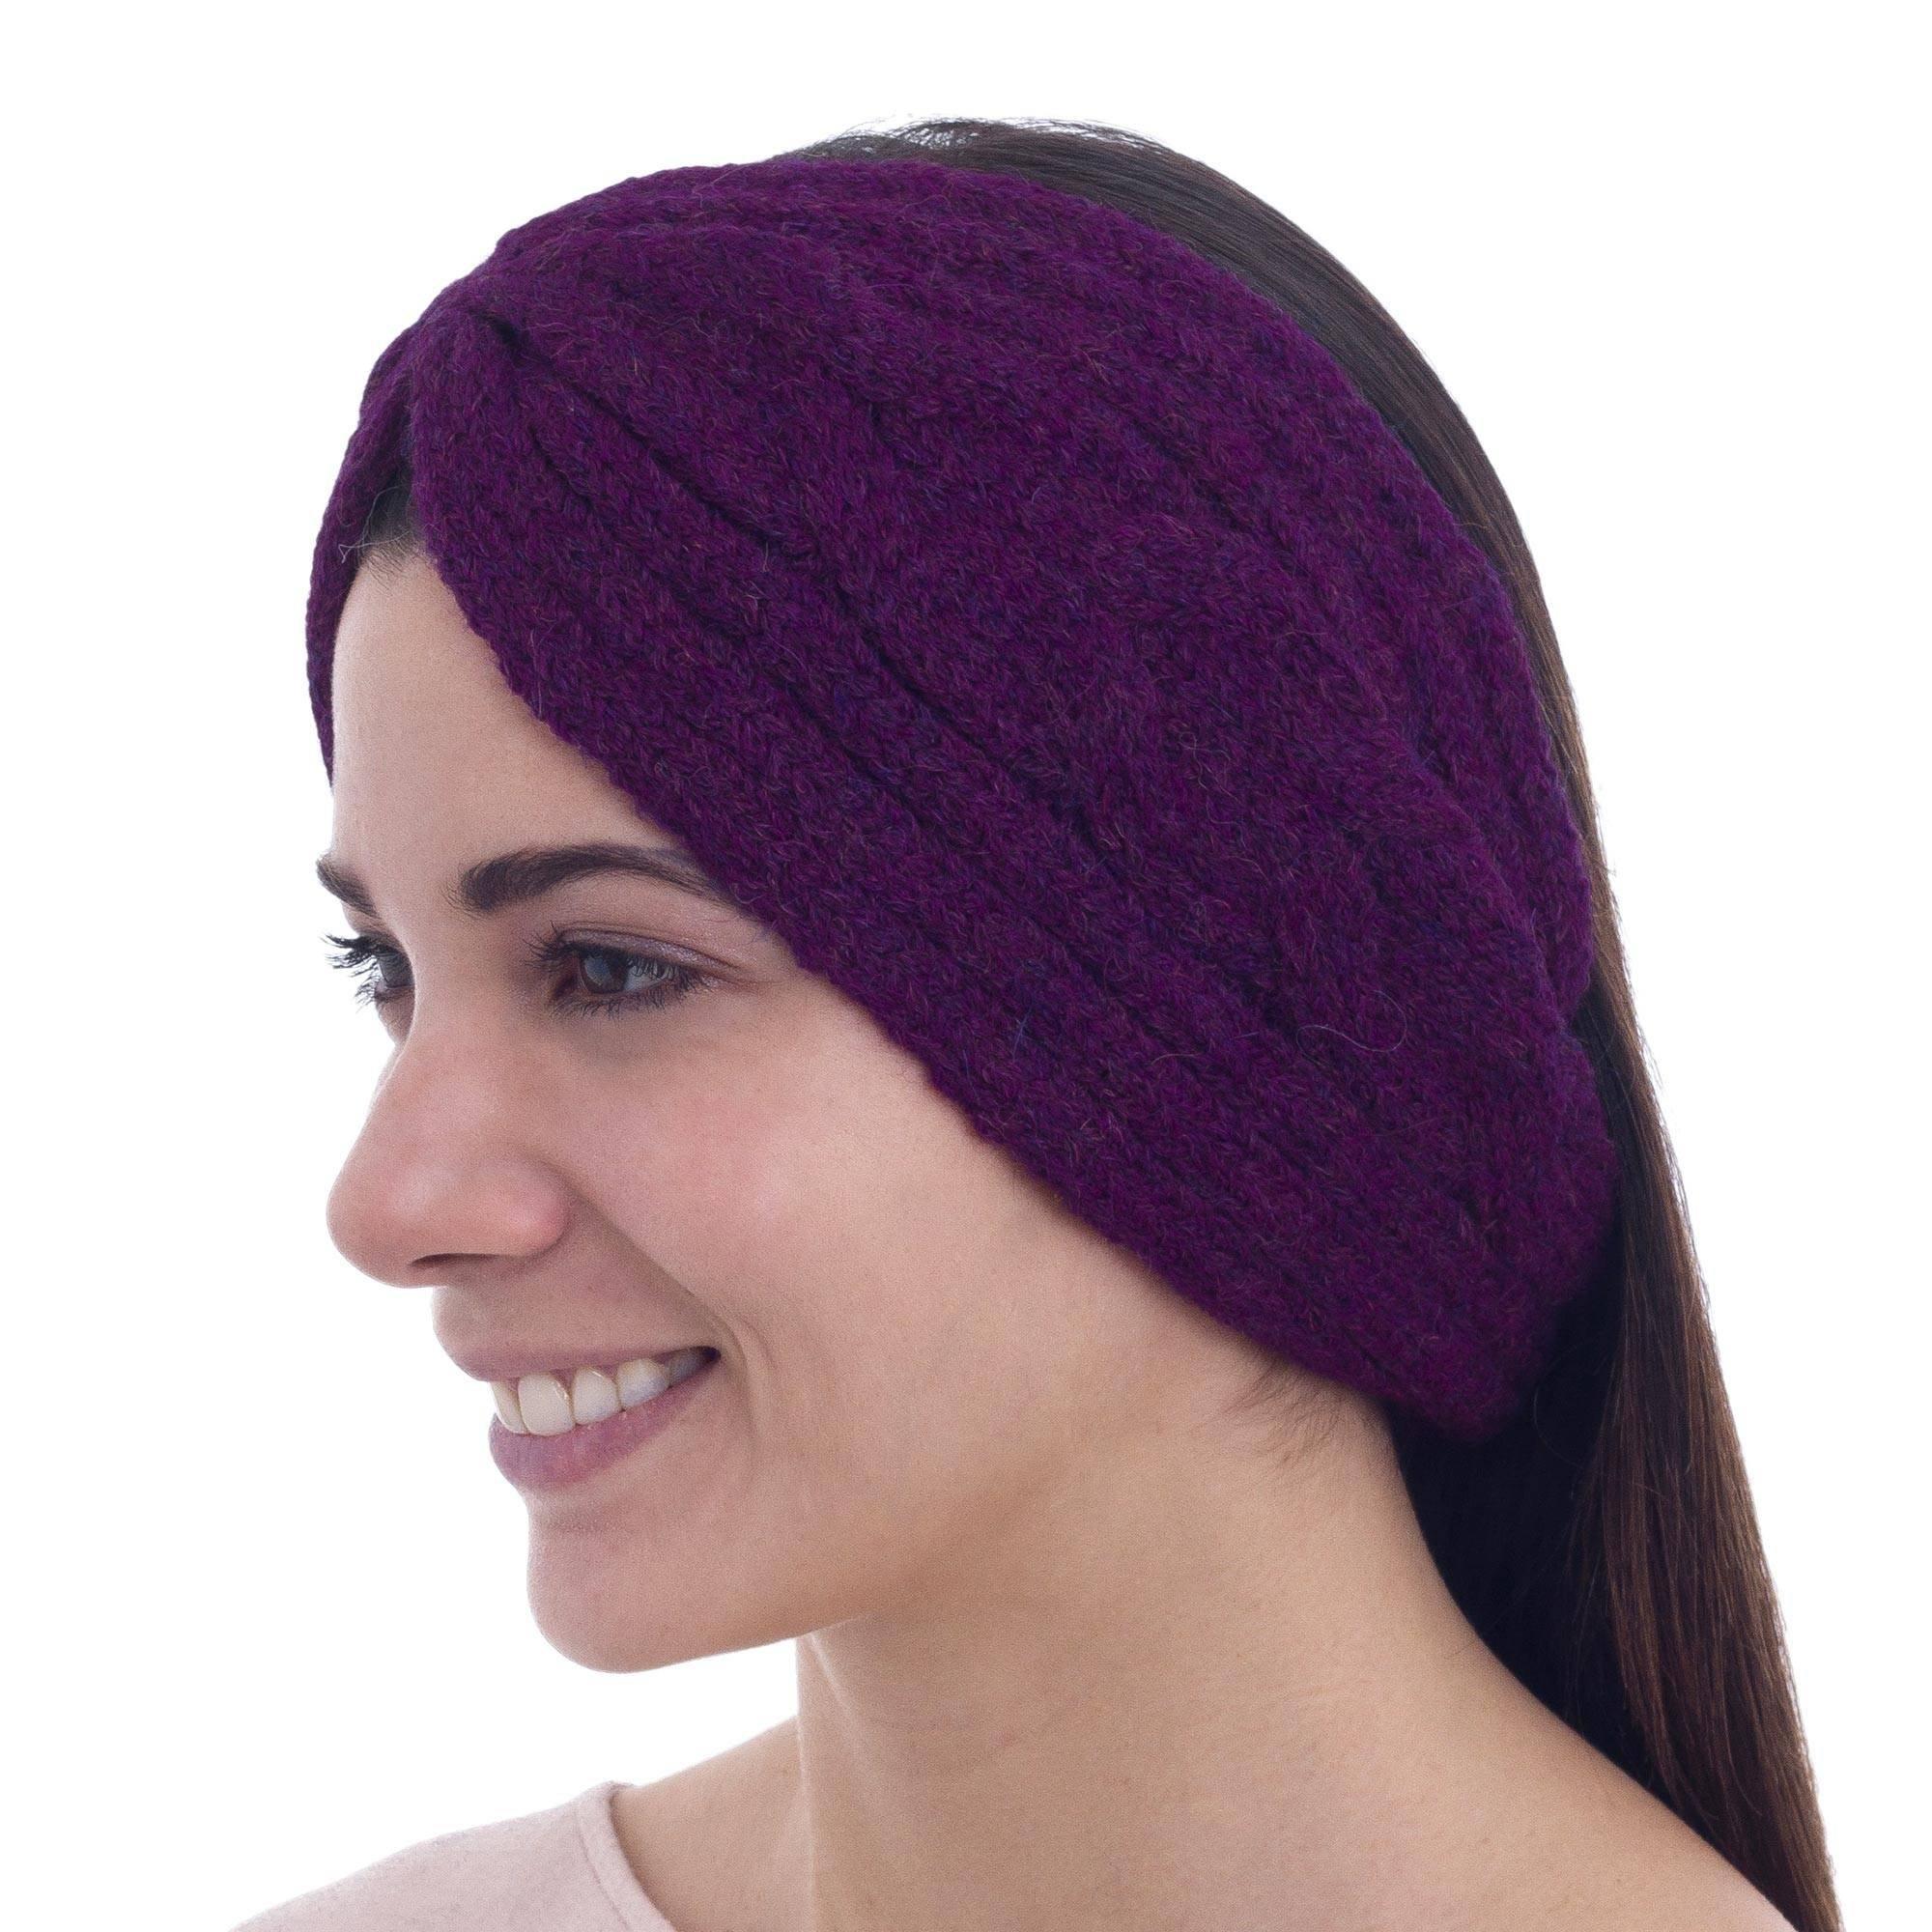 NOVICA Purple Alpaca Blend Ear Warmer, 'Infinite Spirit in Boysenberry' Product Details